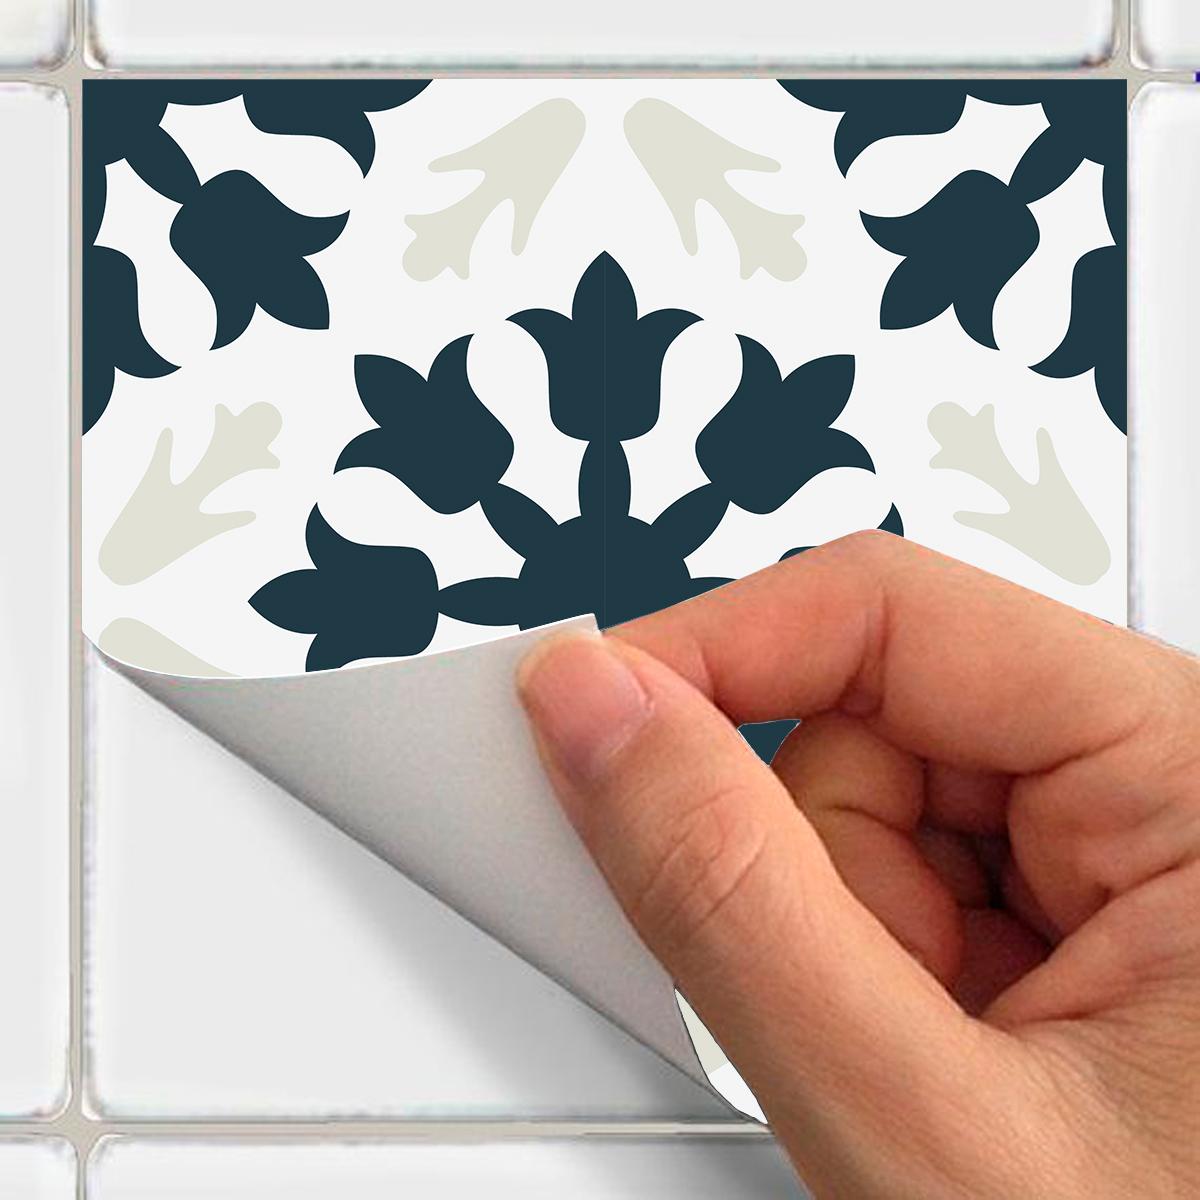 60 stickers carreaux de ciment azulejos meli cuisine. Black Bedroom Furniture Sets. Home Design Ideas